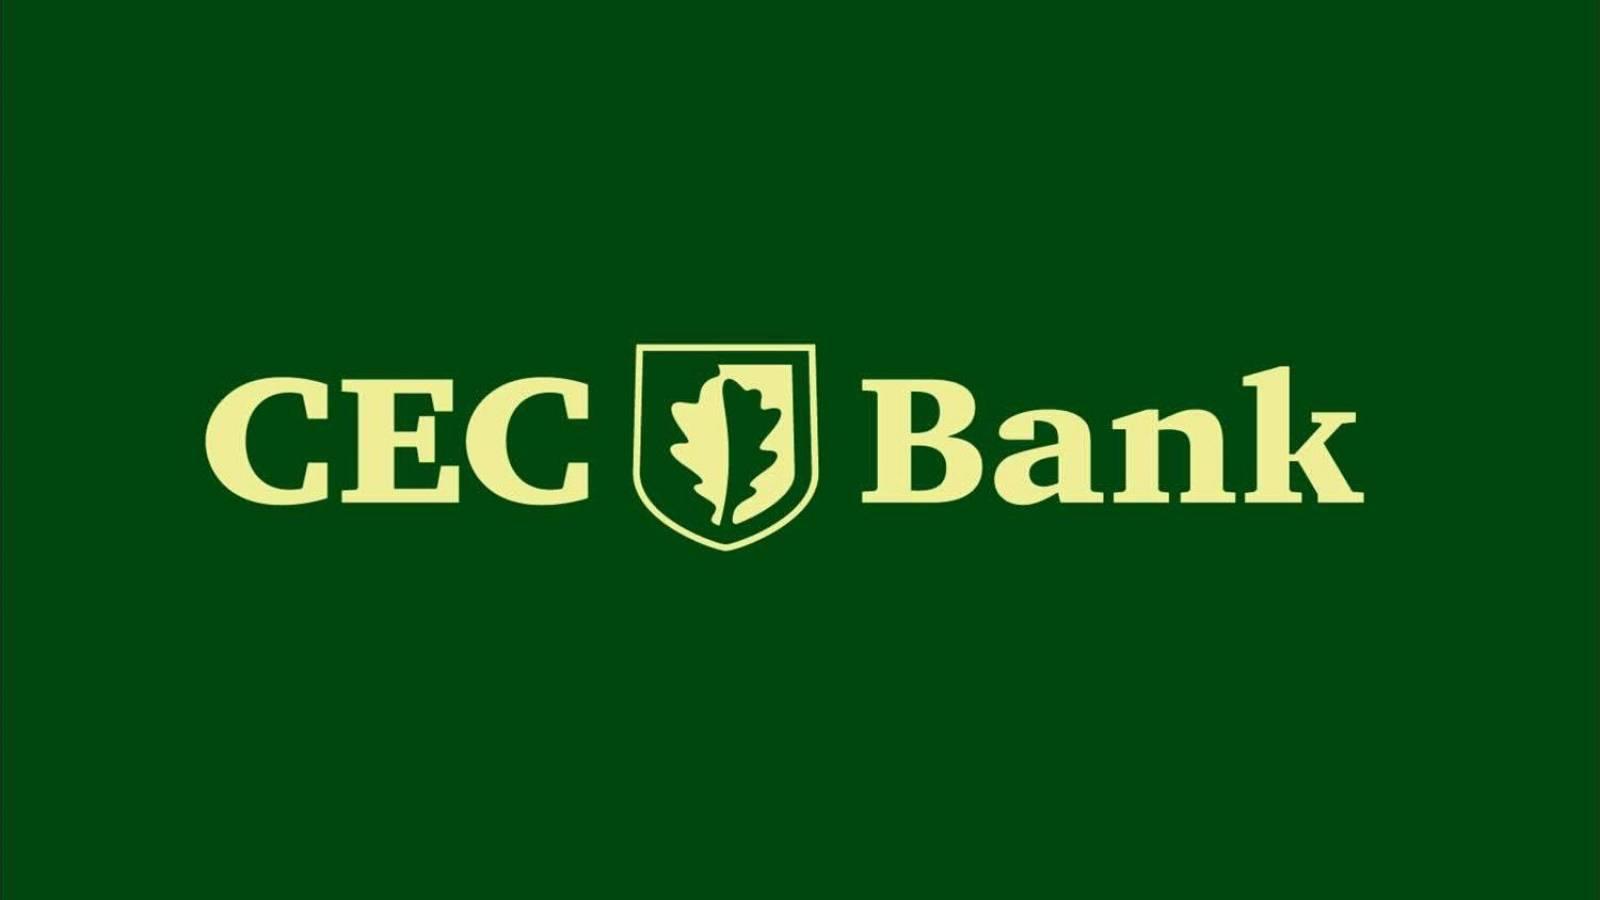 CEC Bank confort